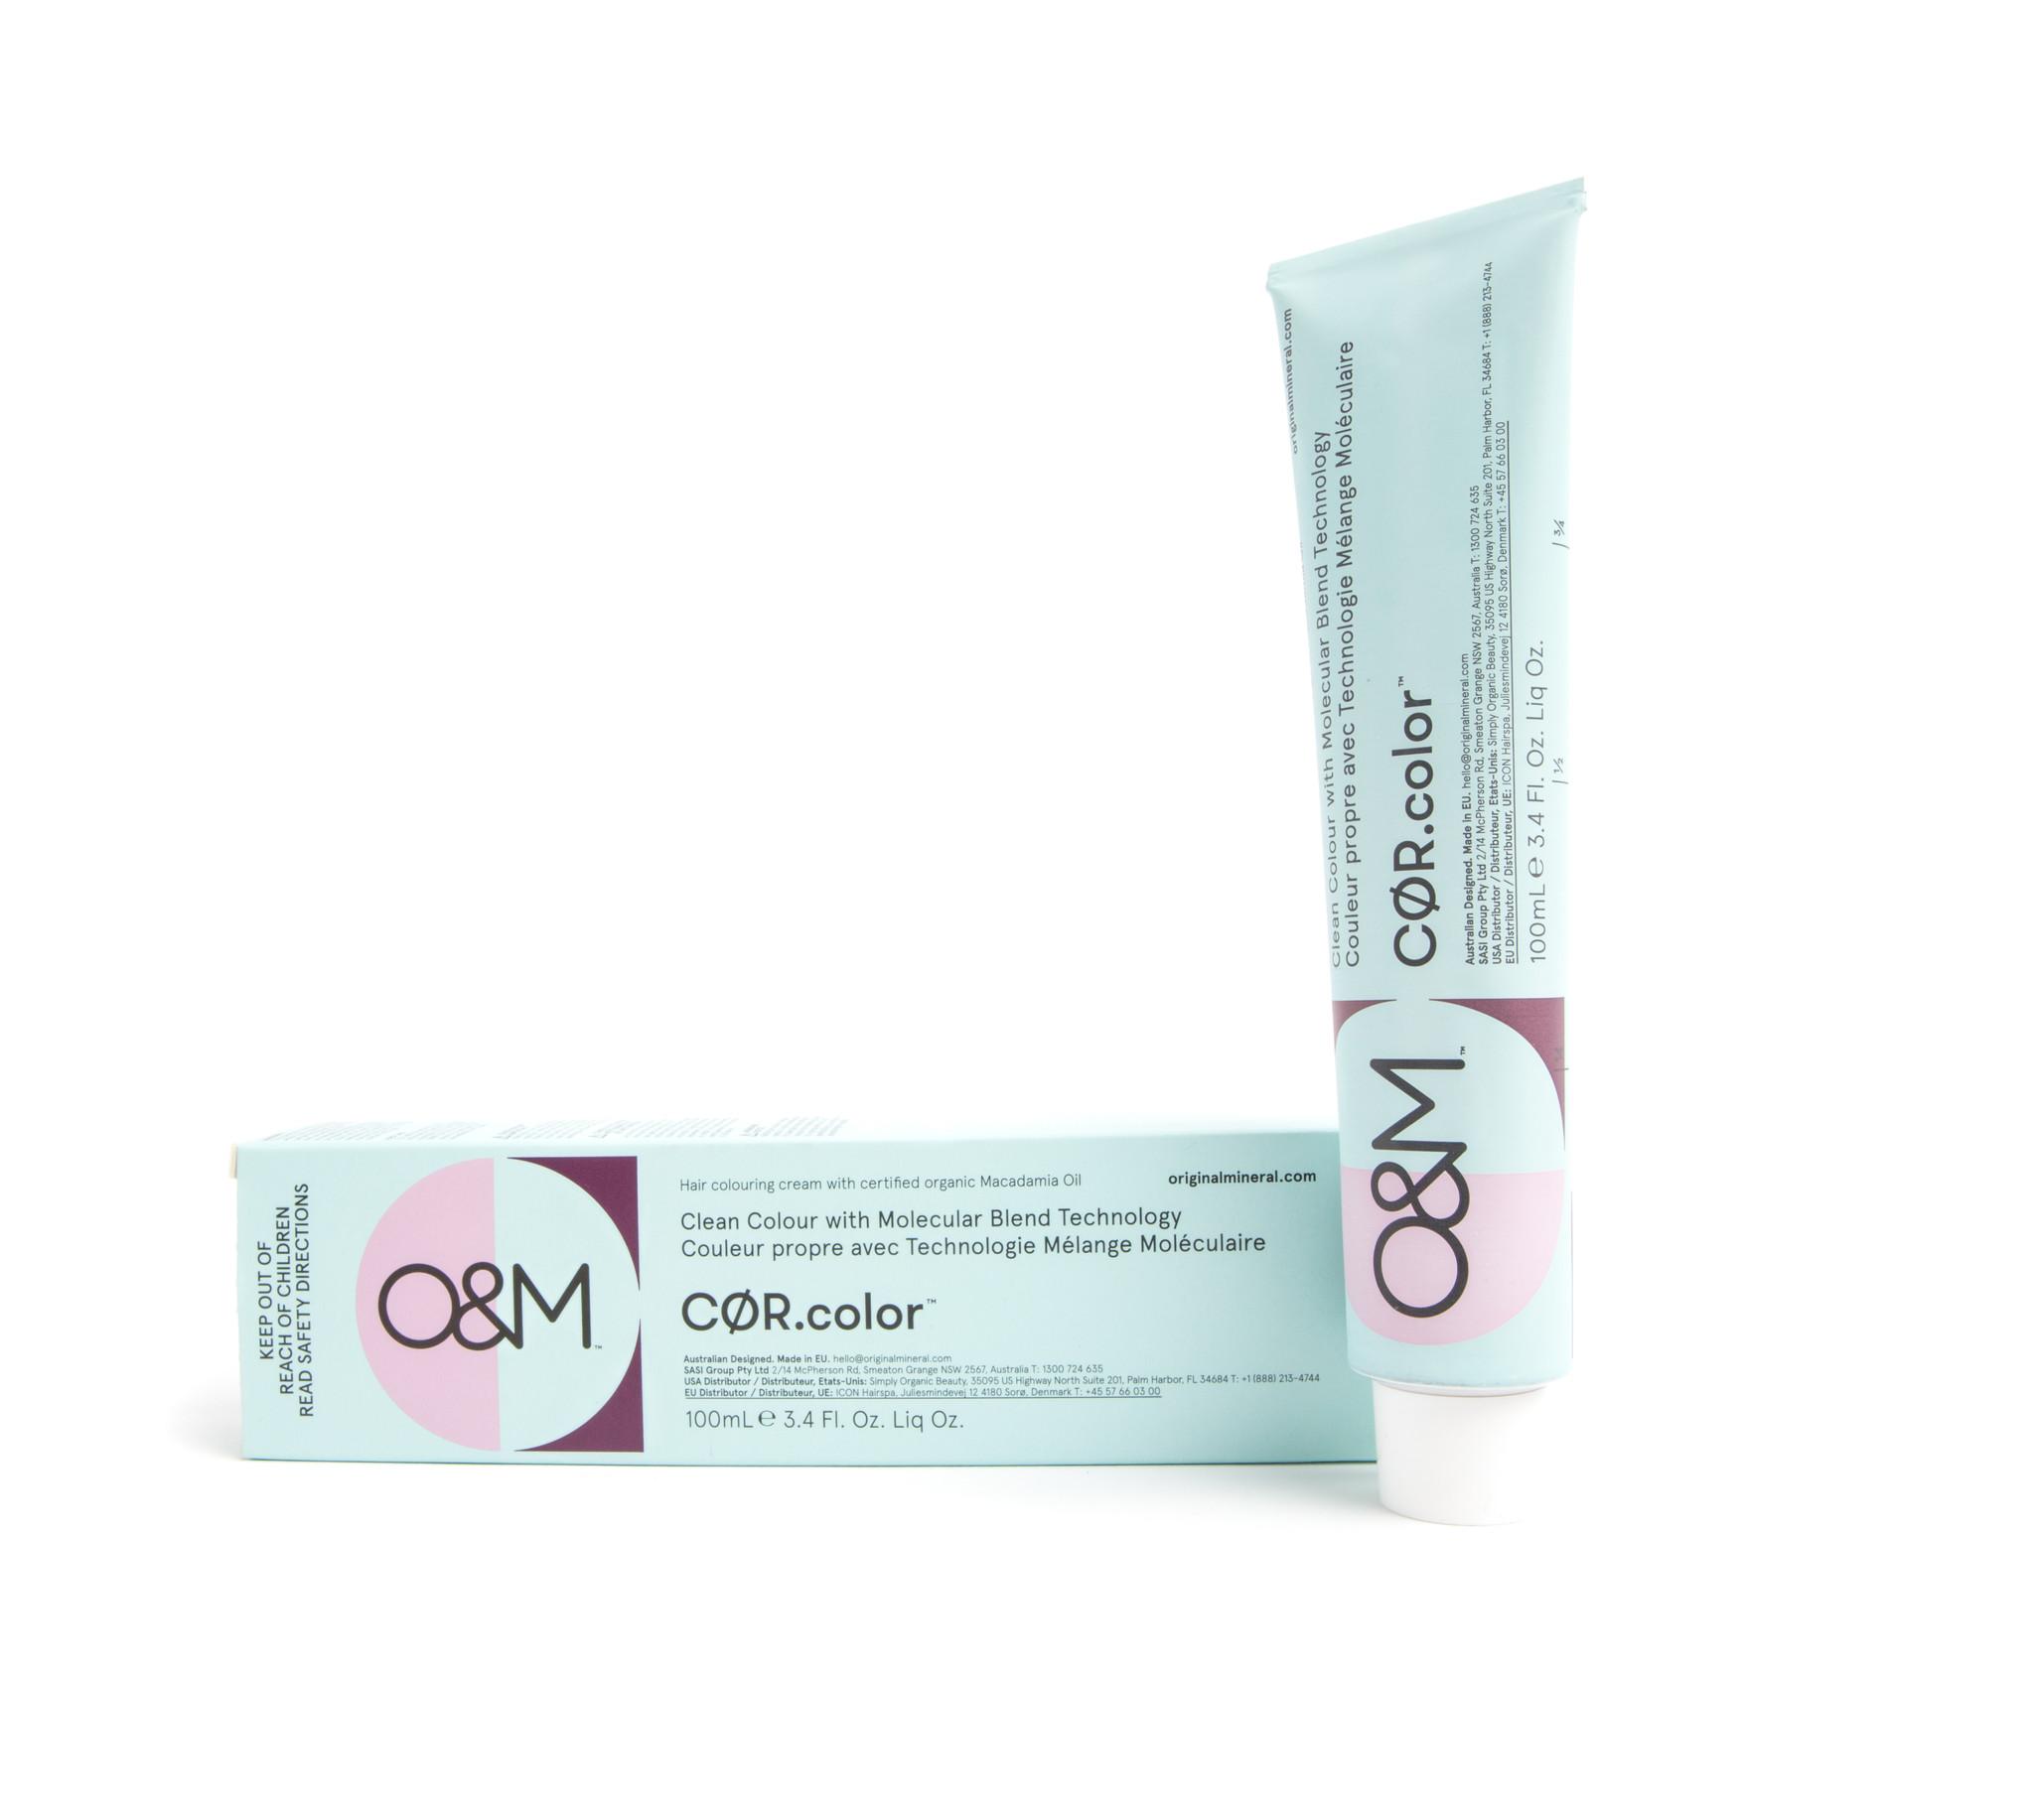 O&M - Original Mineral O&M CØR.color Red Intense Blonde 77.45 100g